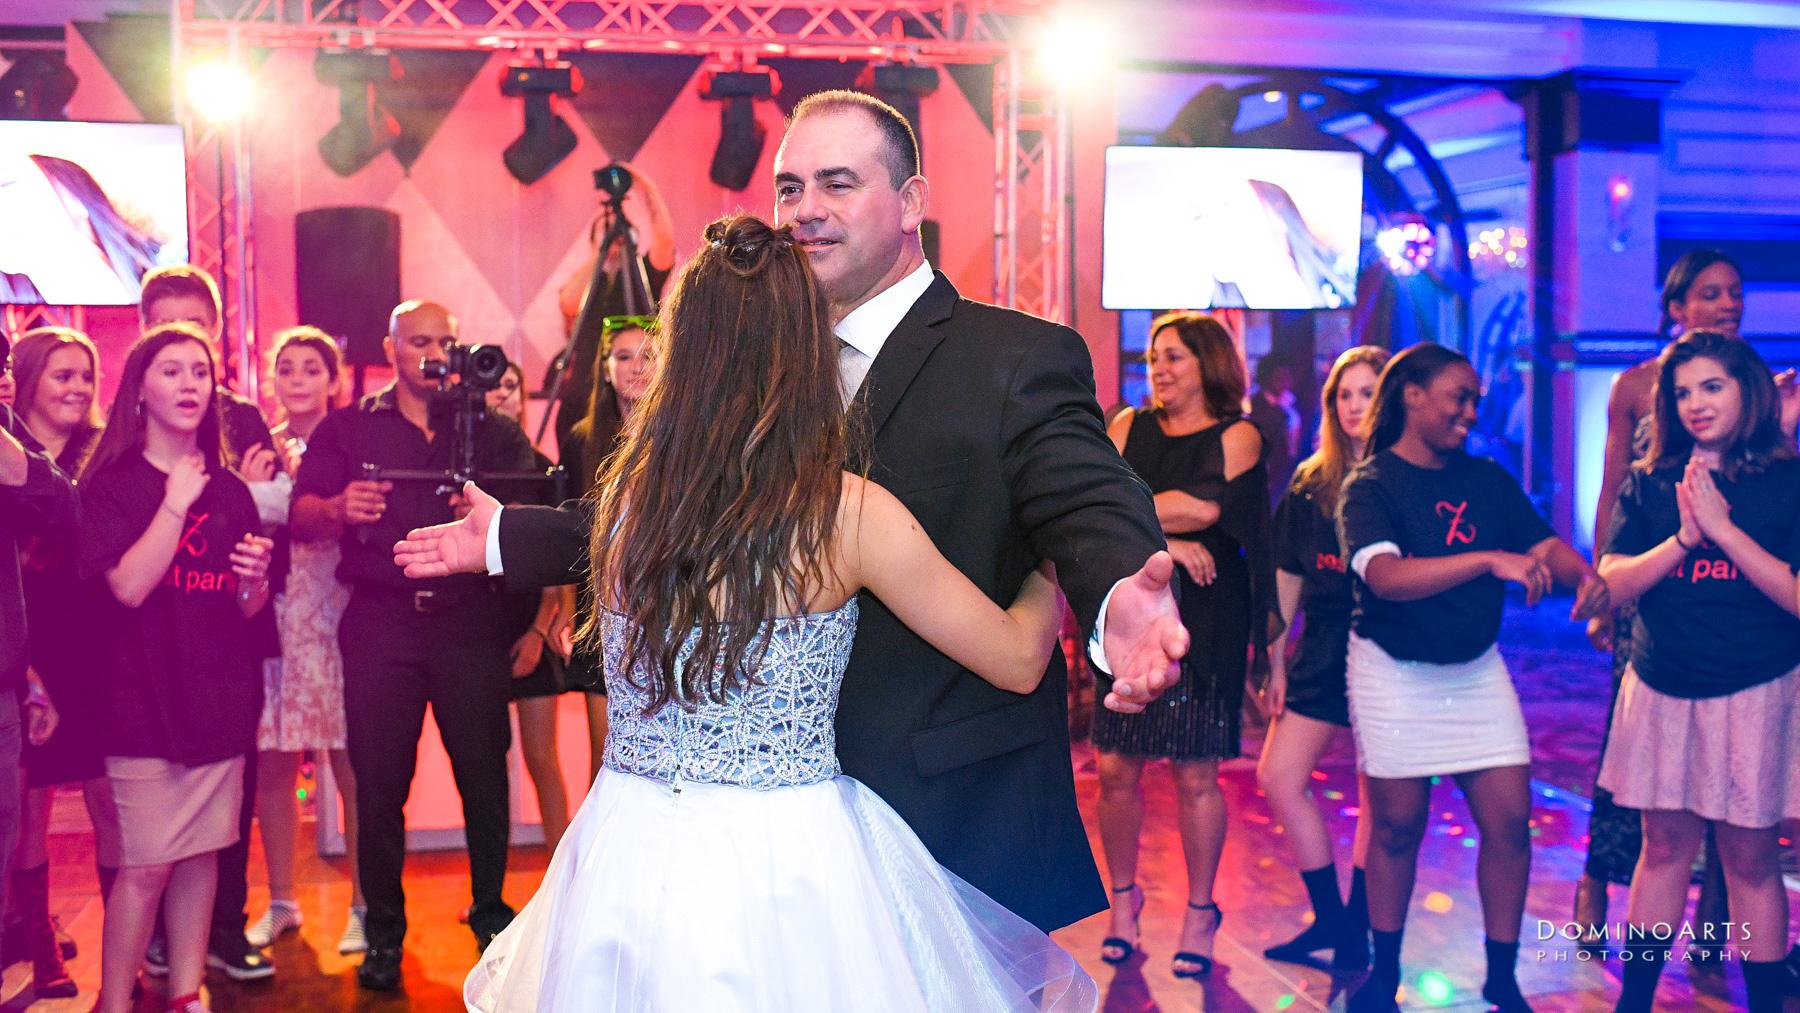 Parent dance pictures at Temple Beth El Mitzvah, Boca Raton Mitzvah